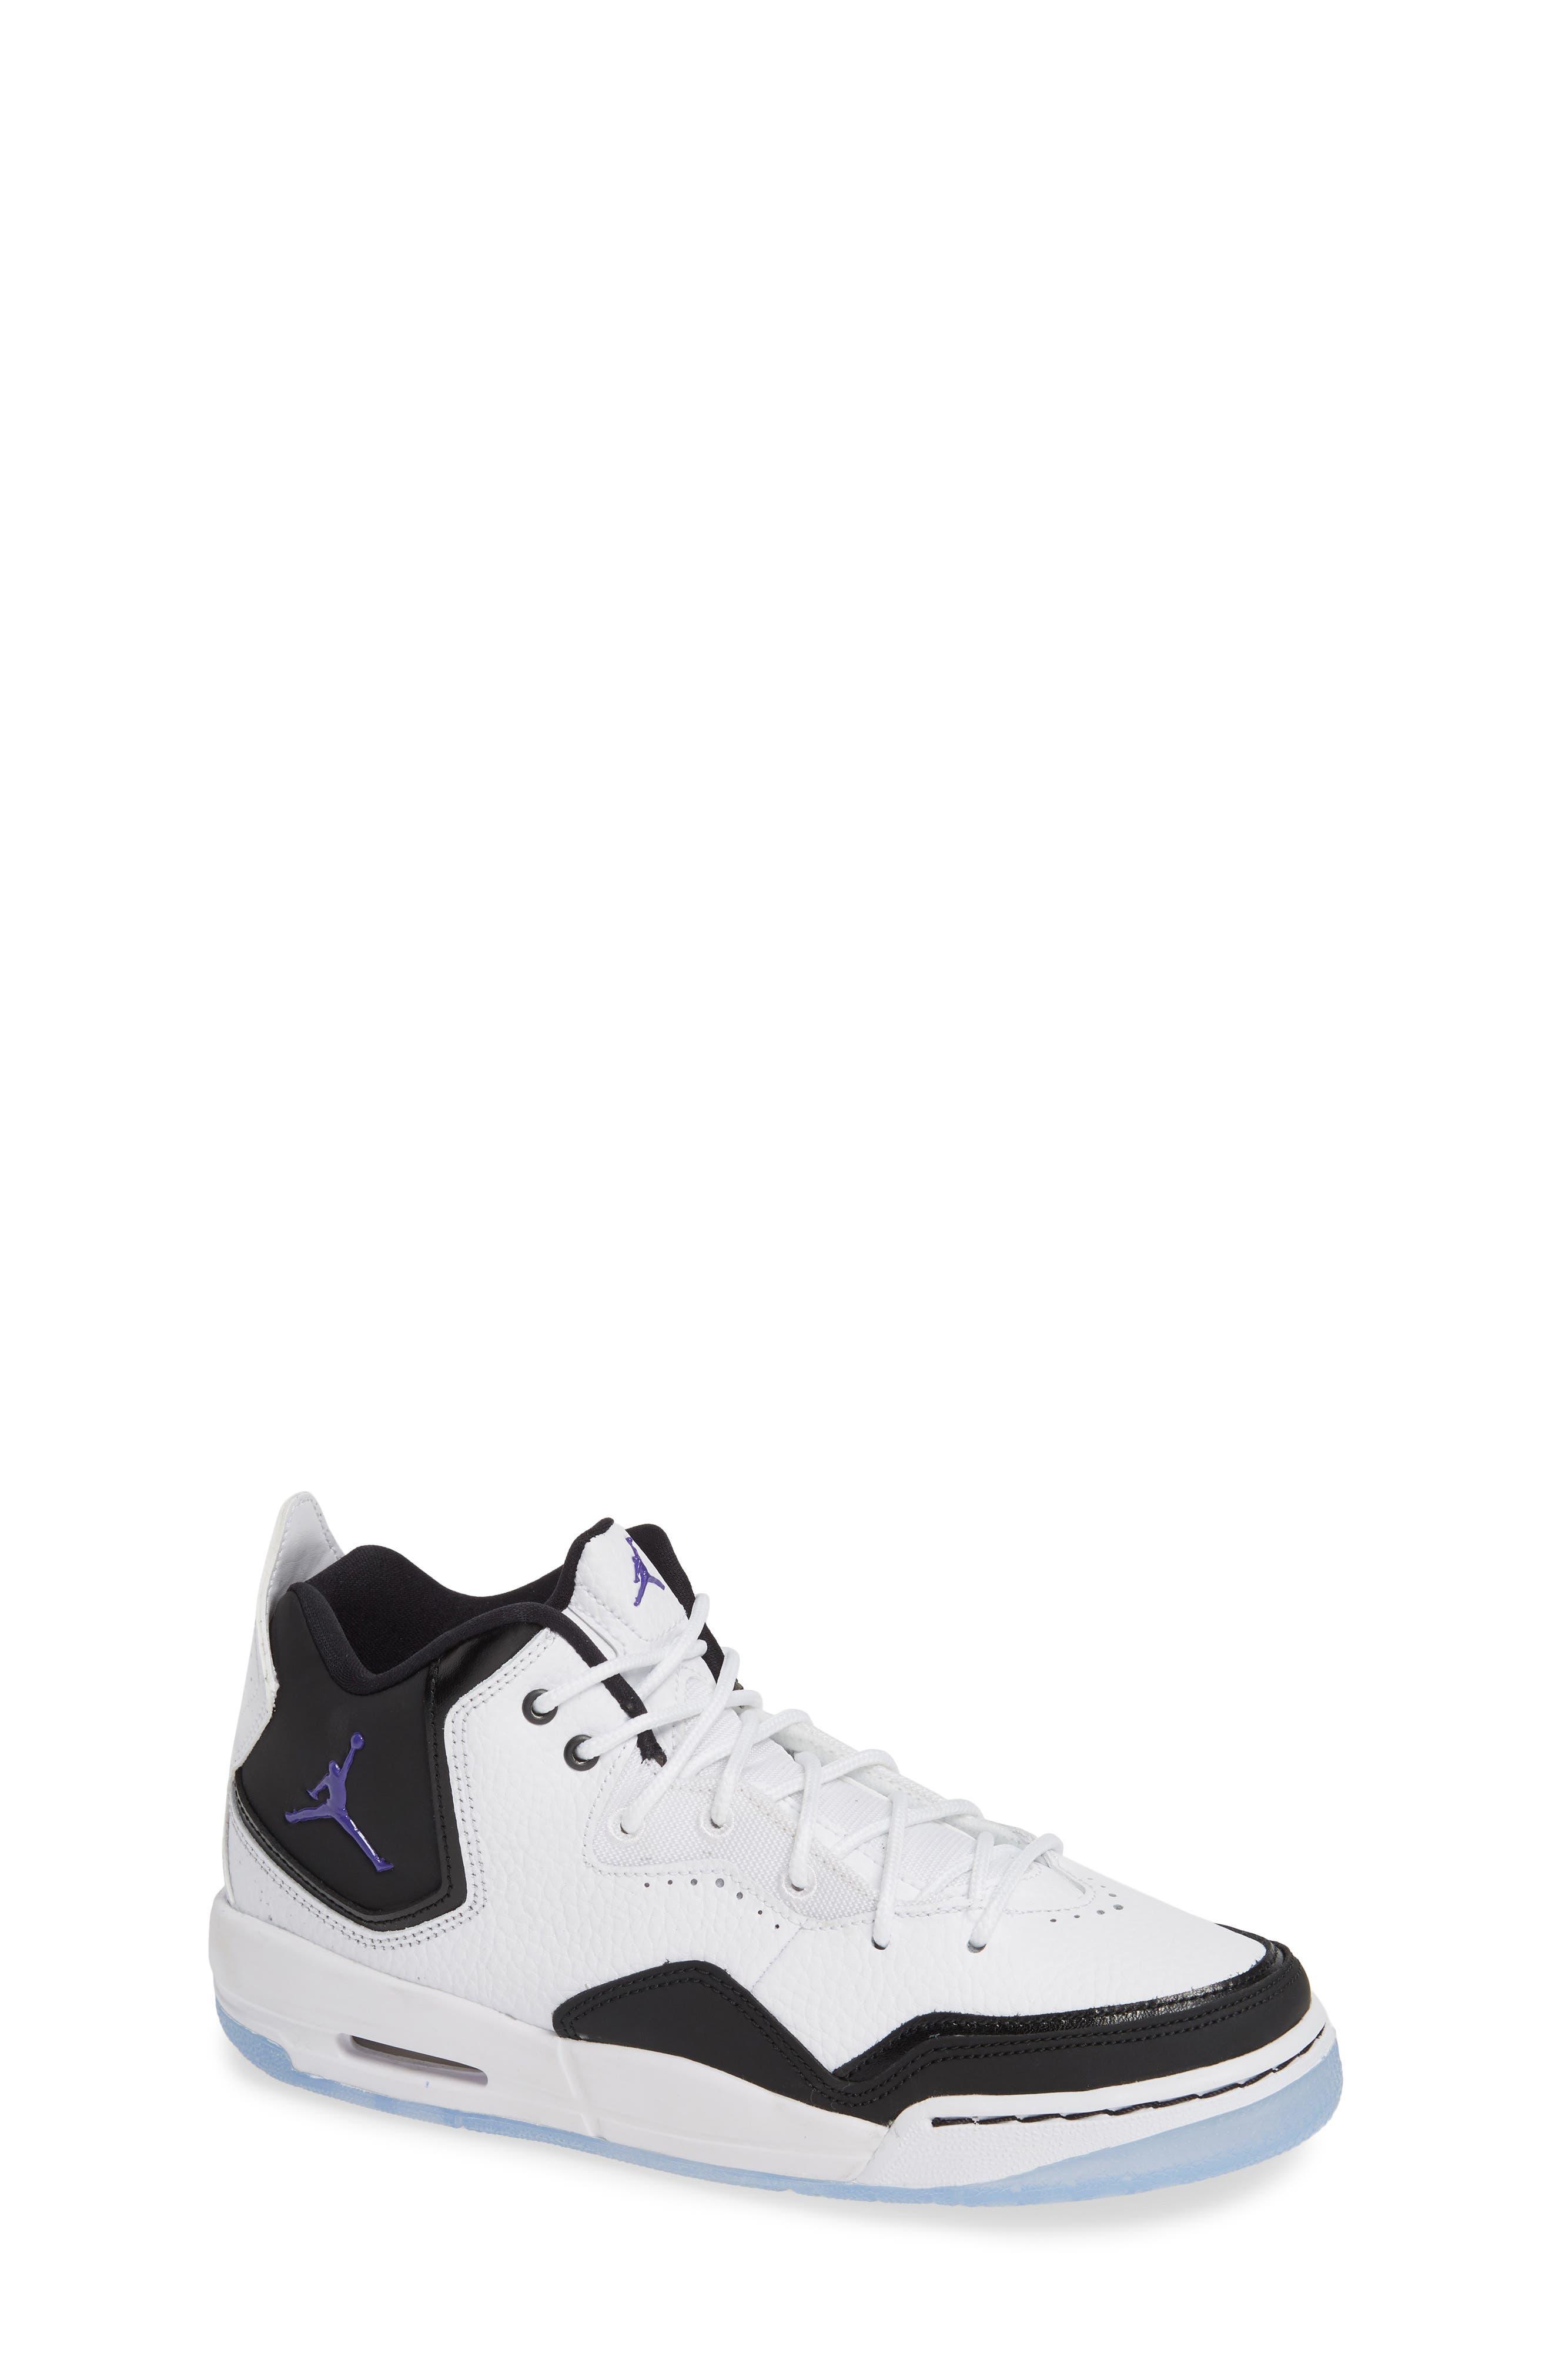 JORDAN Nike Air Jordan Courtside 23 Sneaker, Main, color, WHITE/ CONCORD BLACK